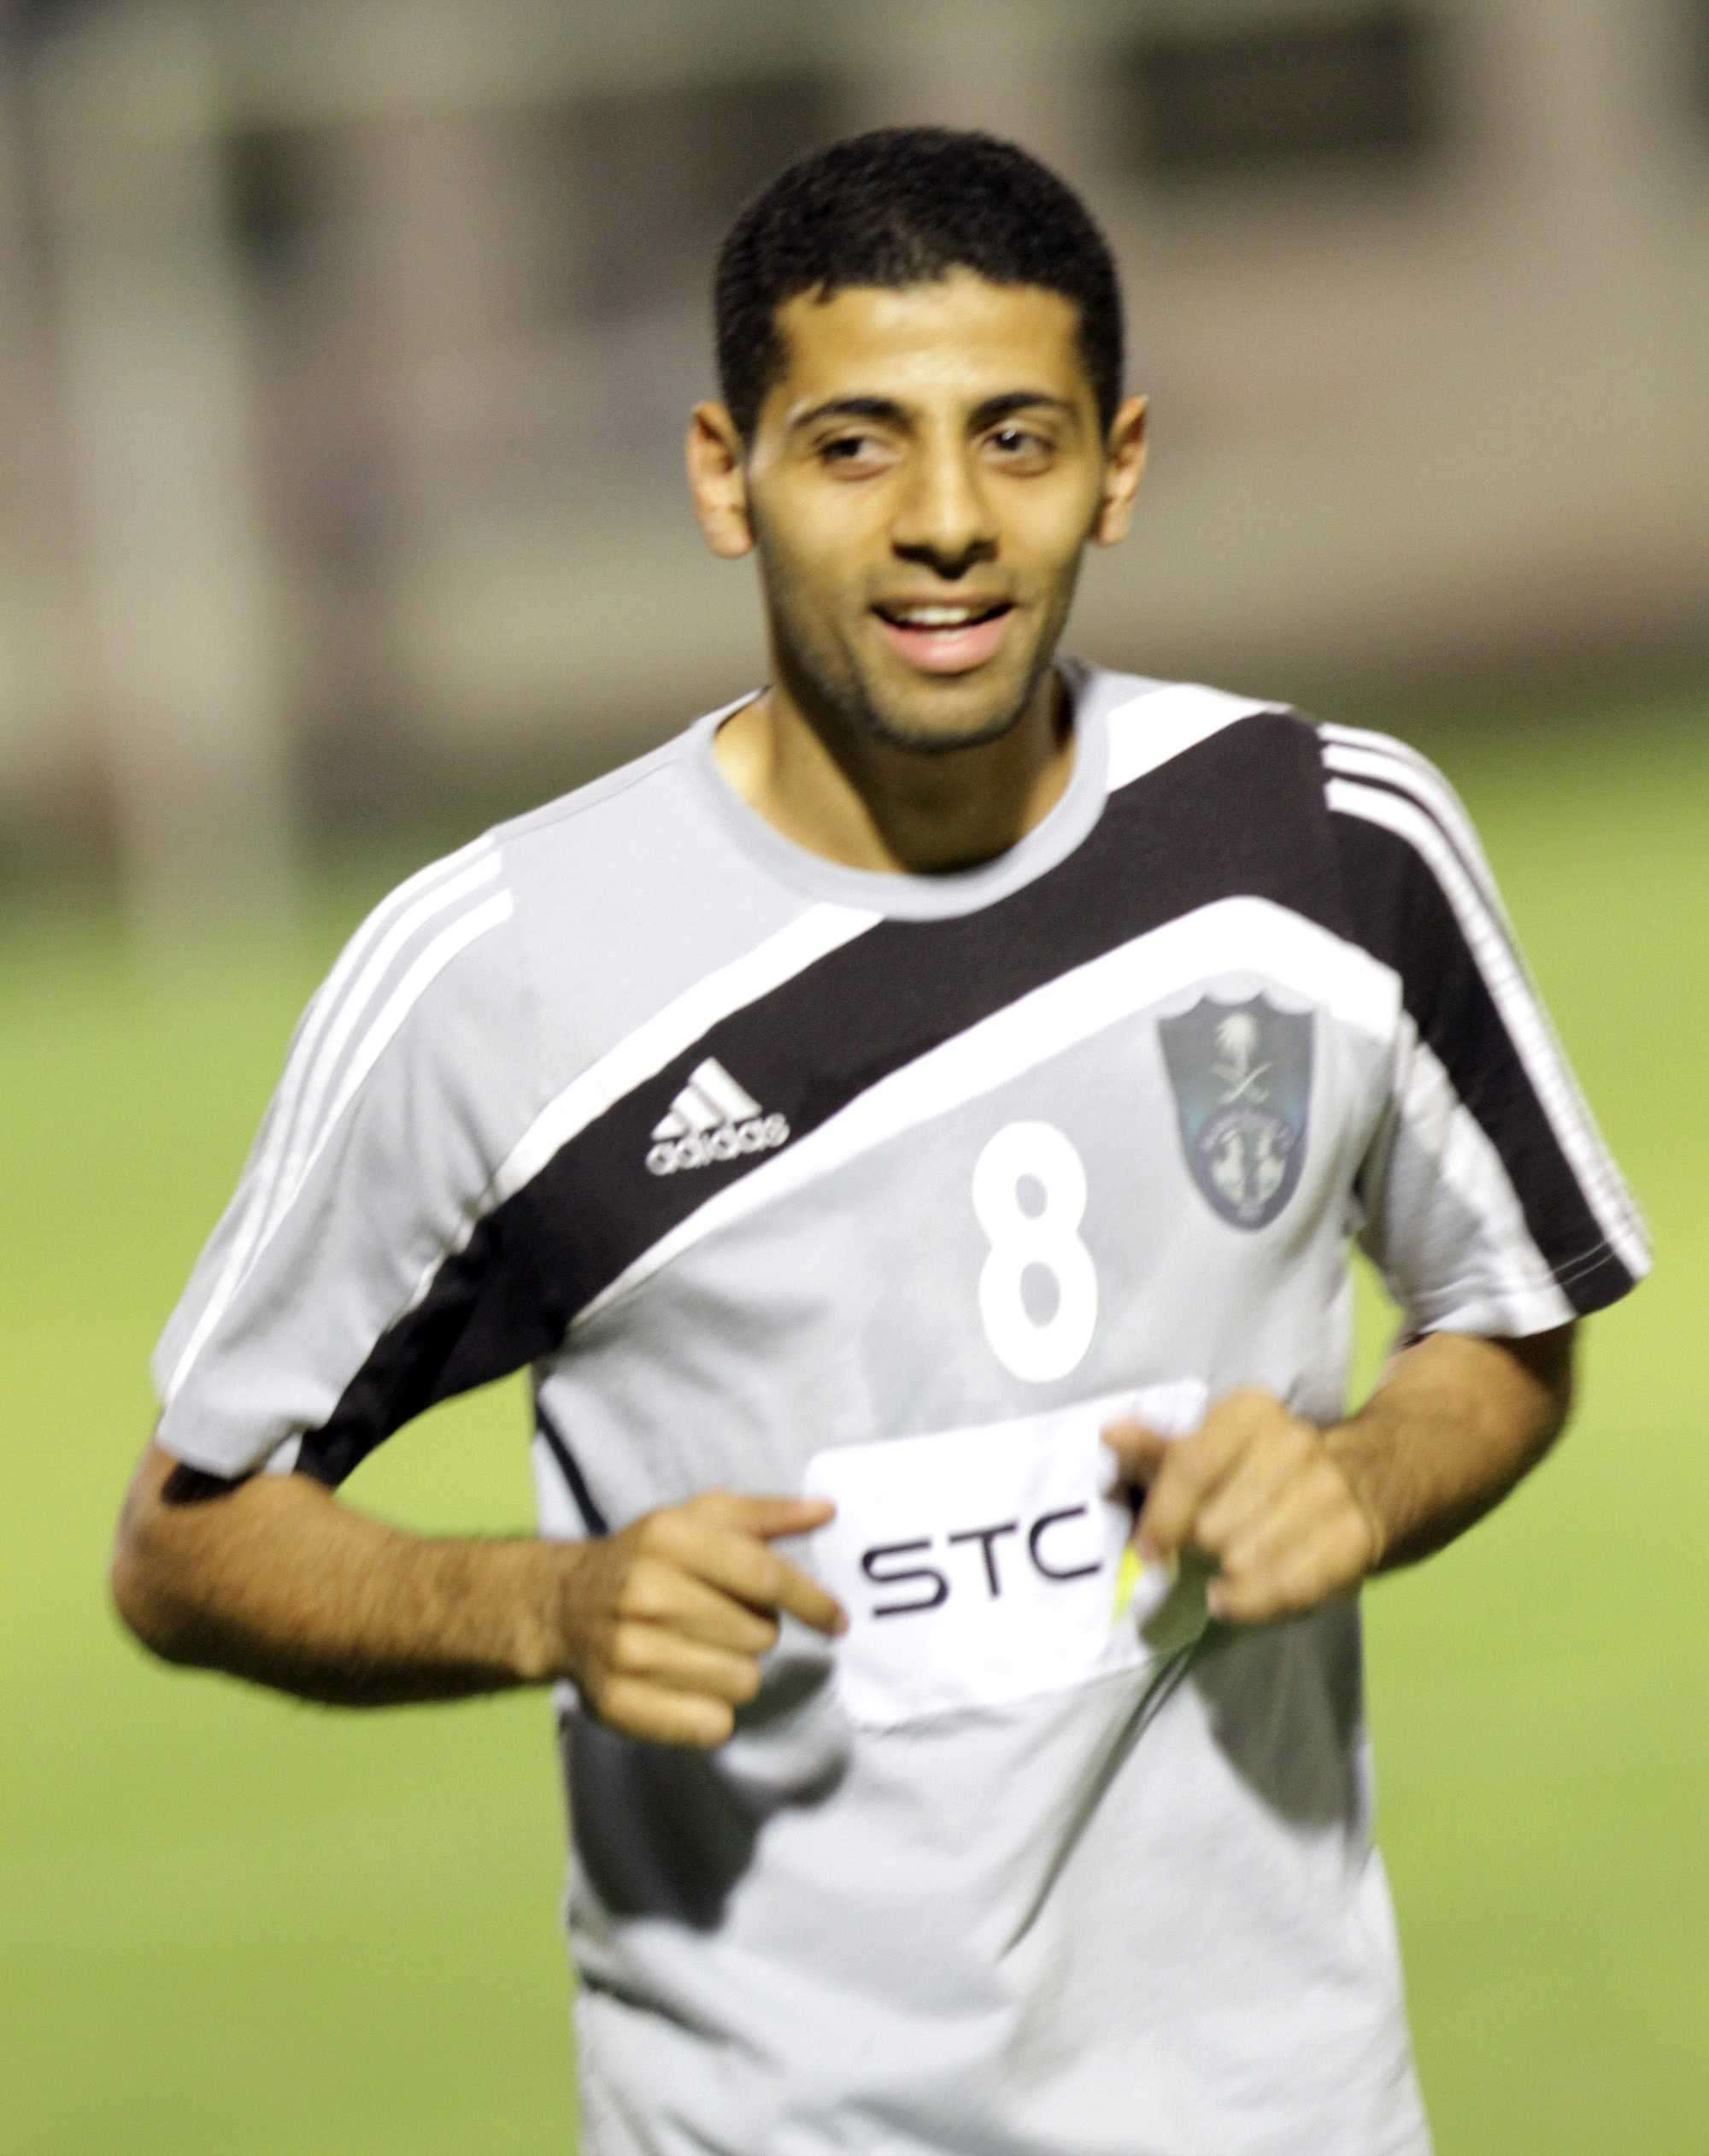 Taisir Al Jassim